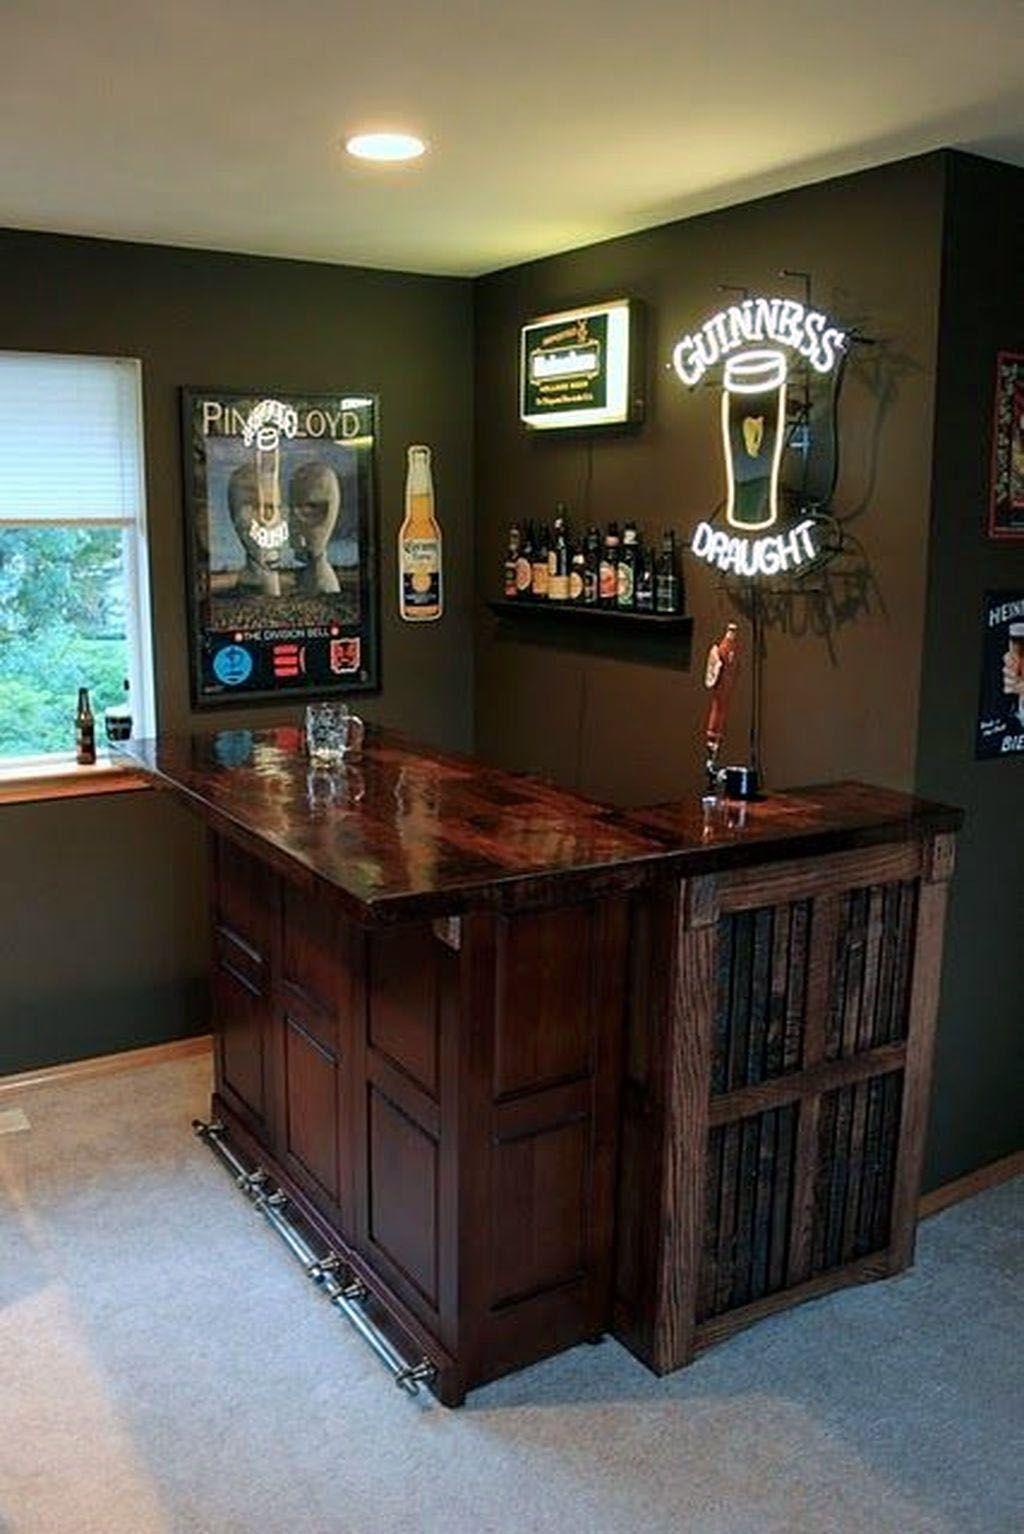 Trendy basement bar ideas budget to inspire you | Home bar ...